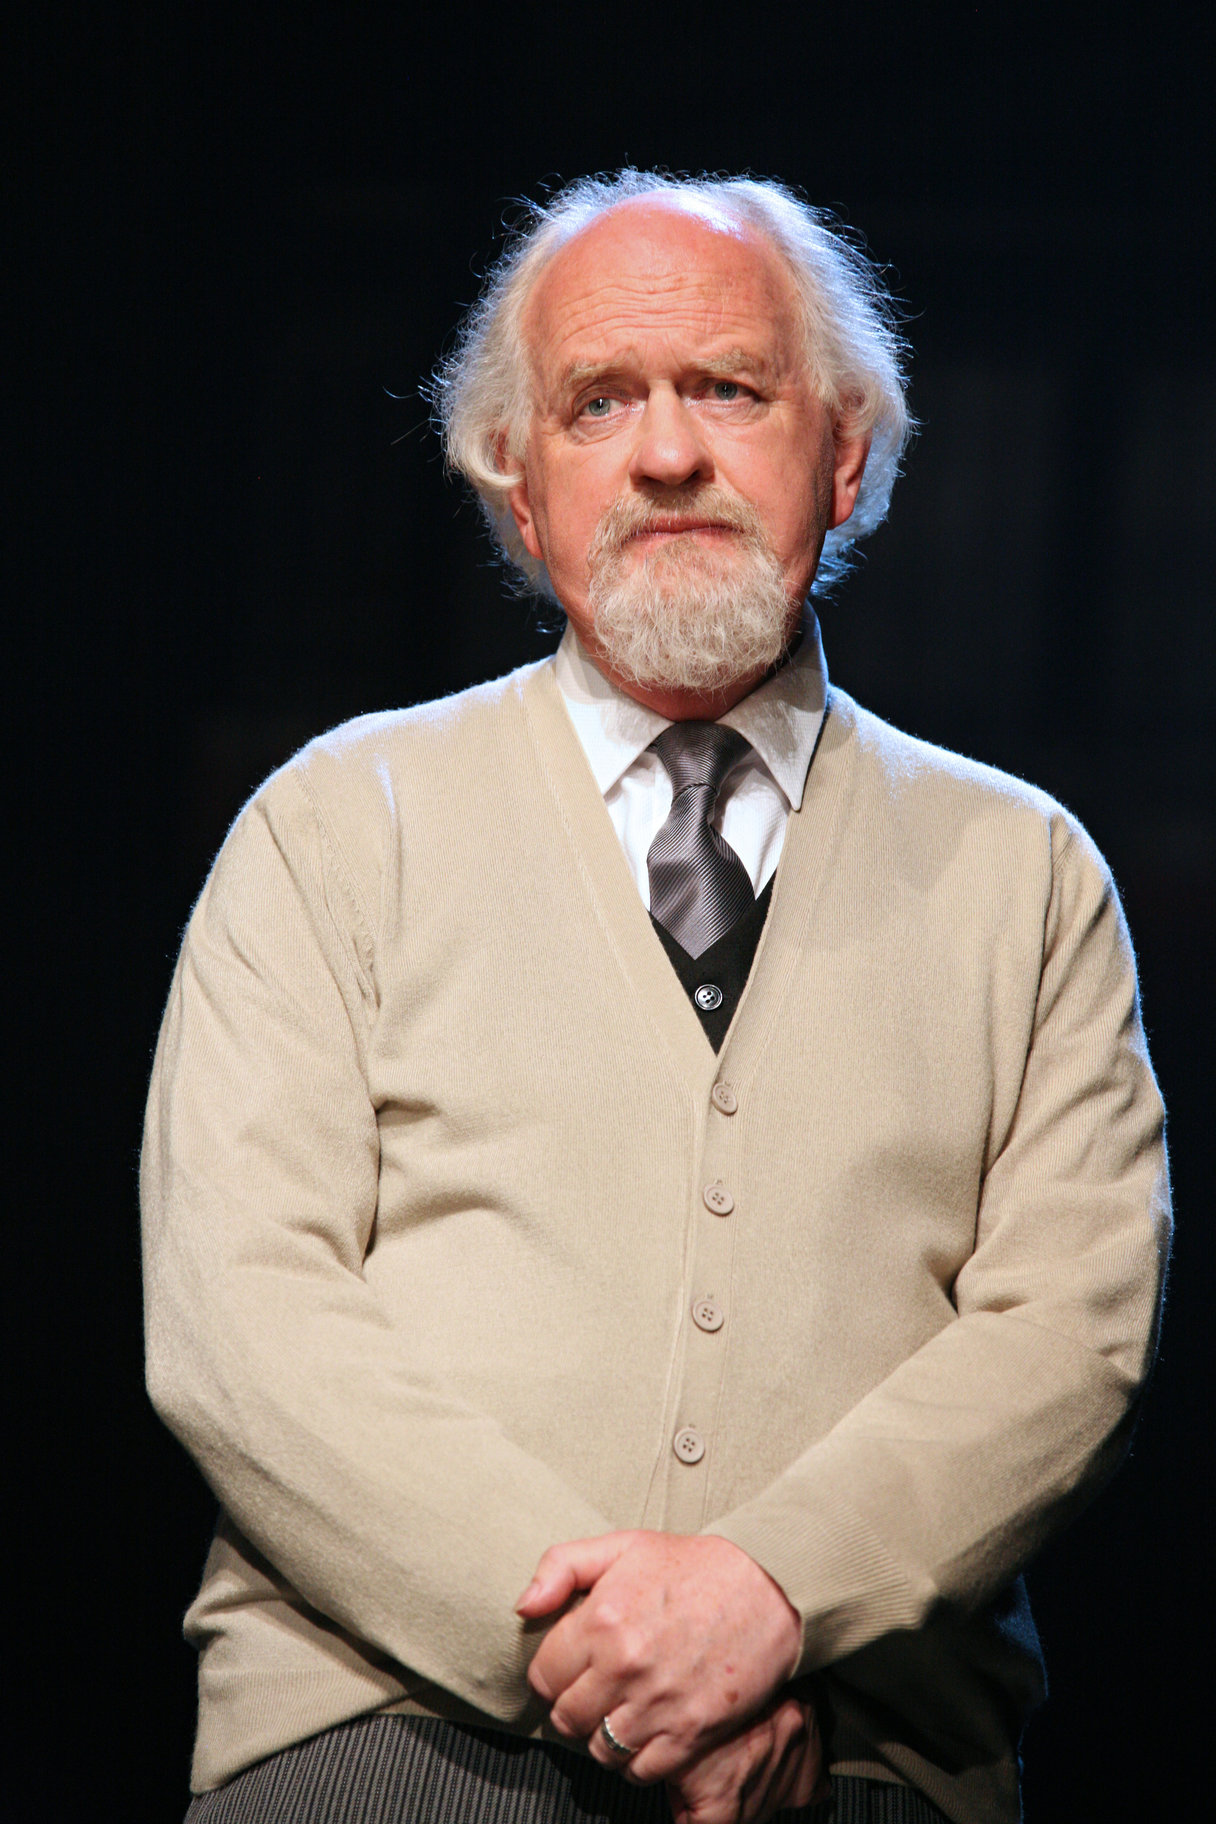 Polonius in a grey cardigan.